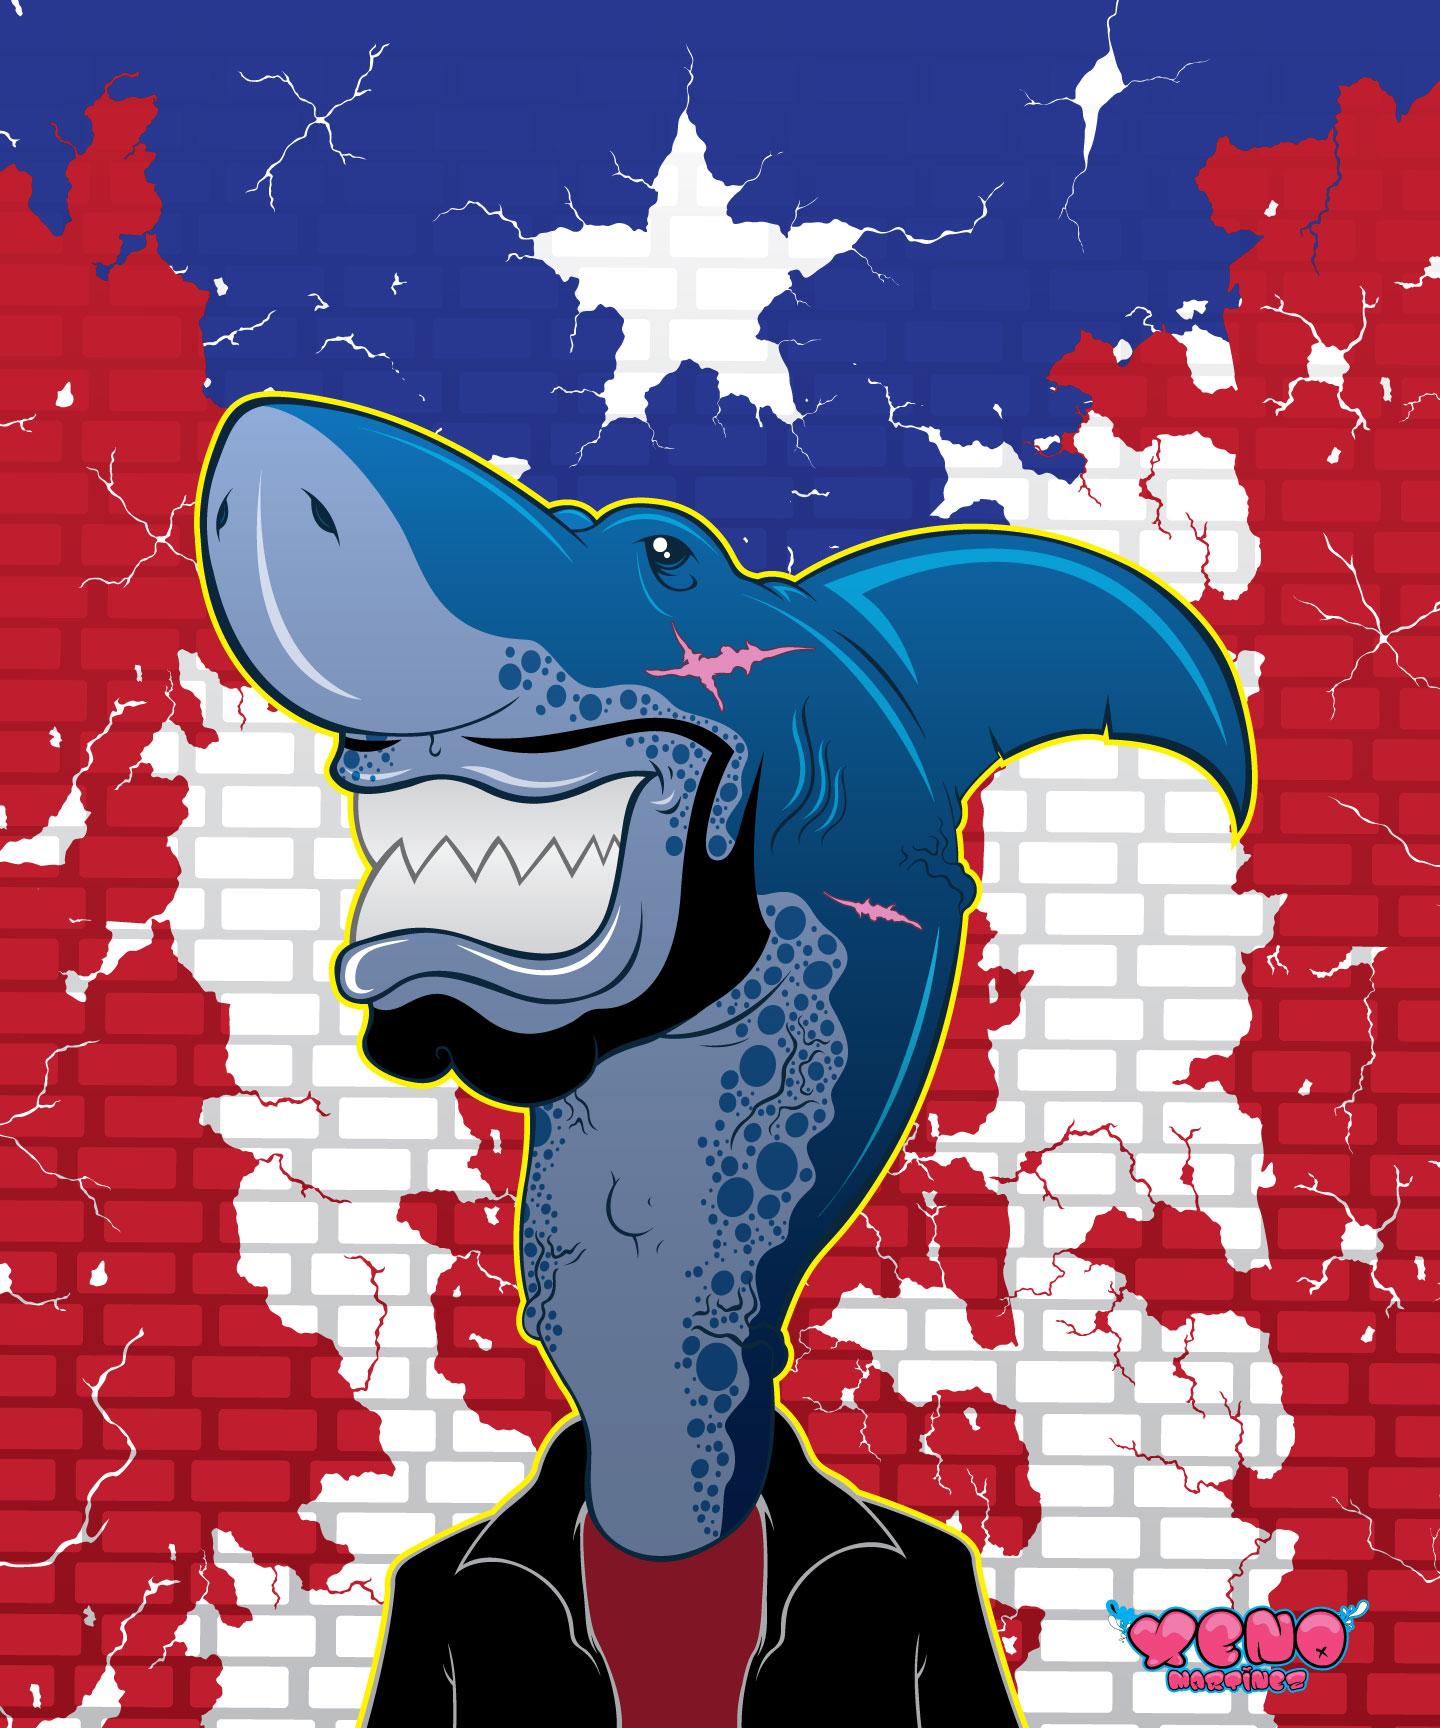 Boricua Shark (July, 2015)